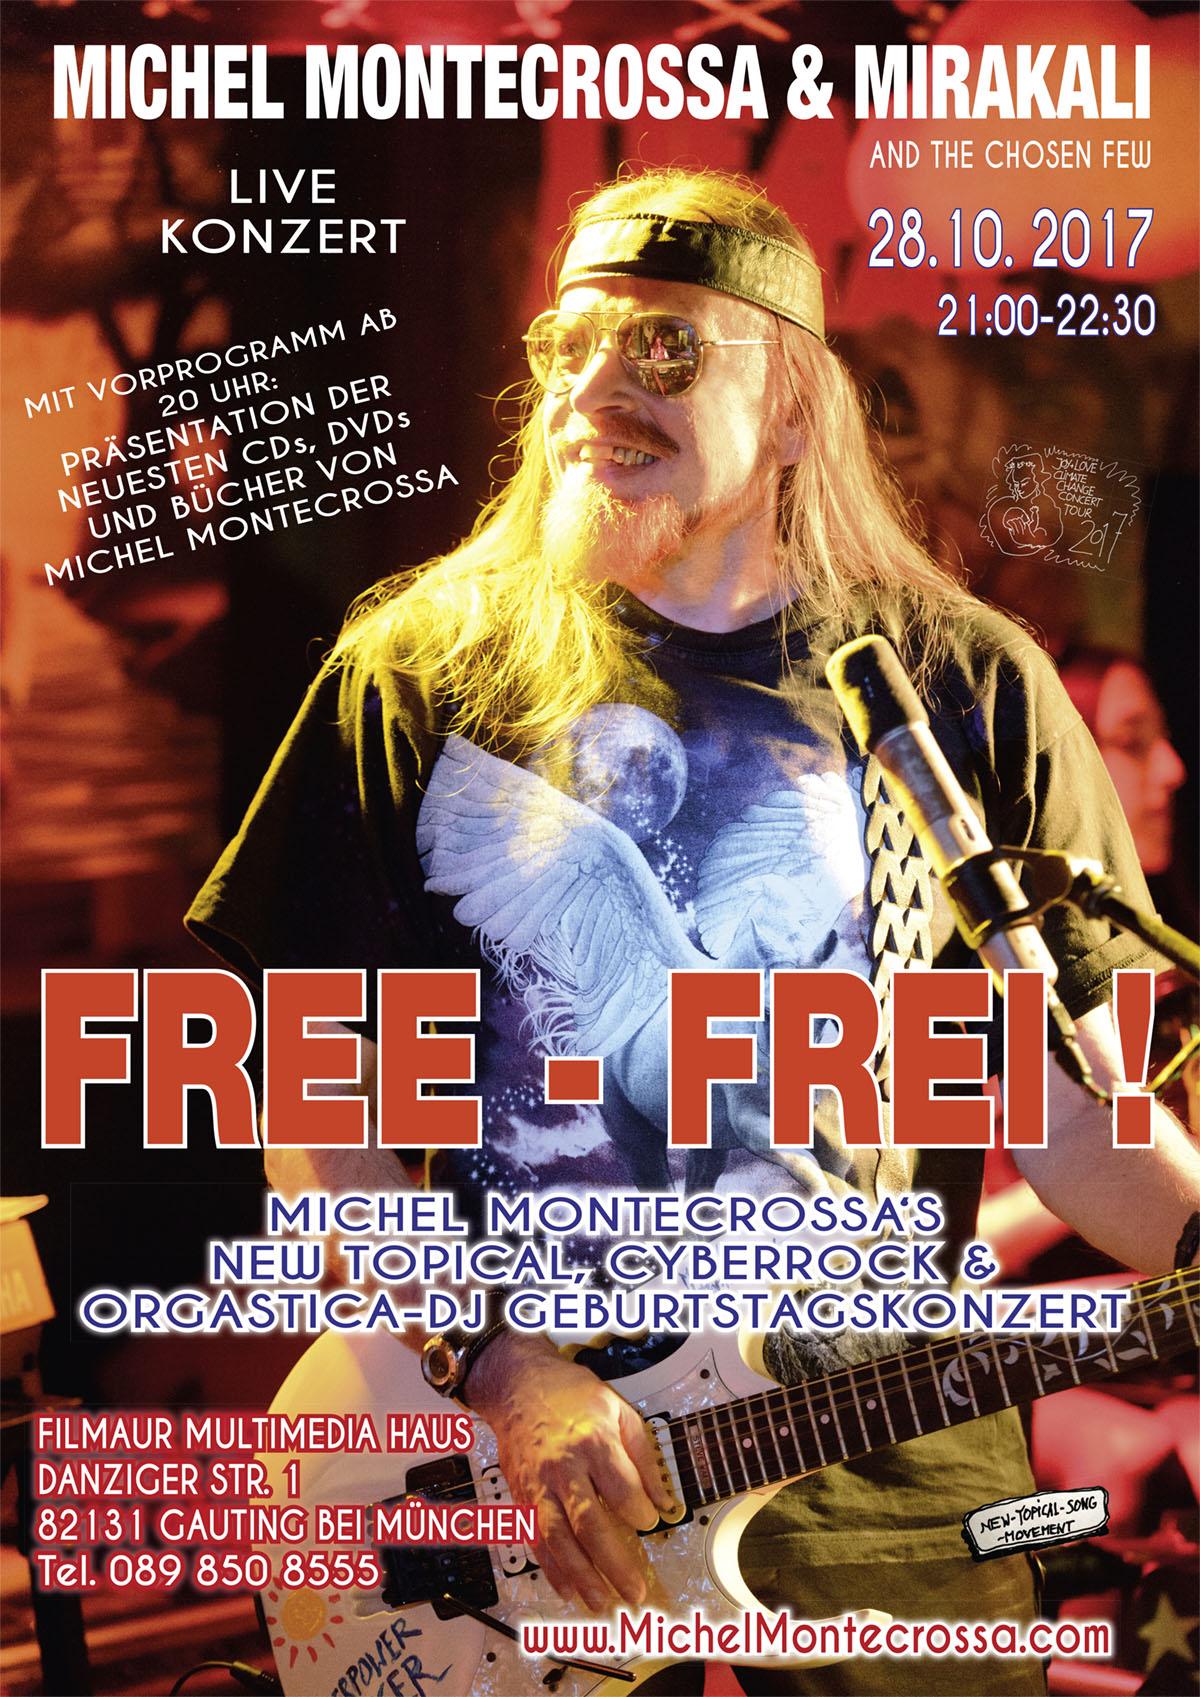 Michel Montecrossa's 'Free – Frei!' Birthday Concert: